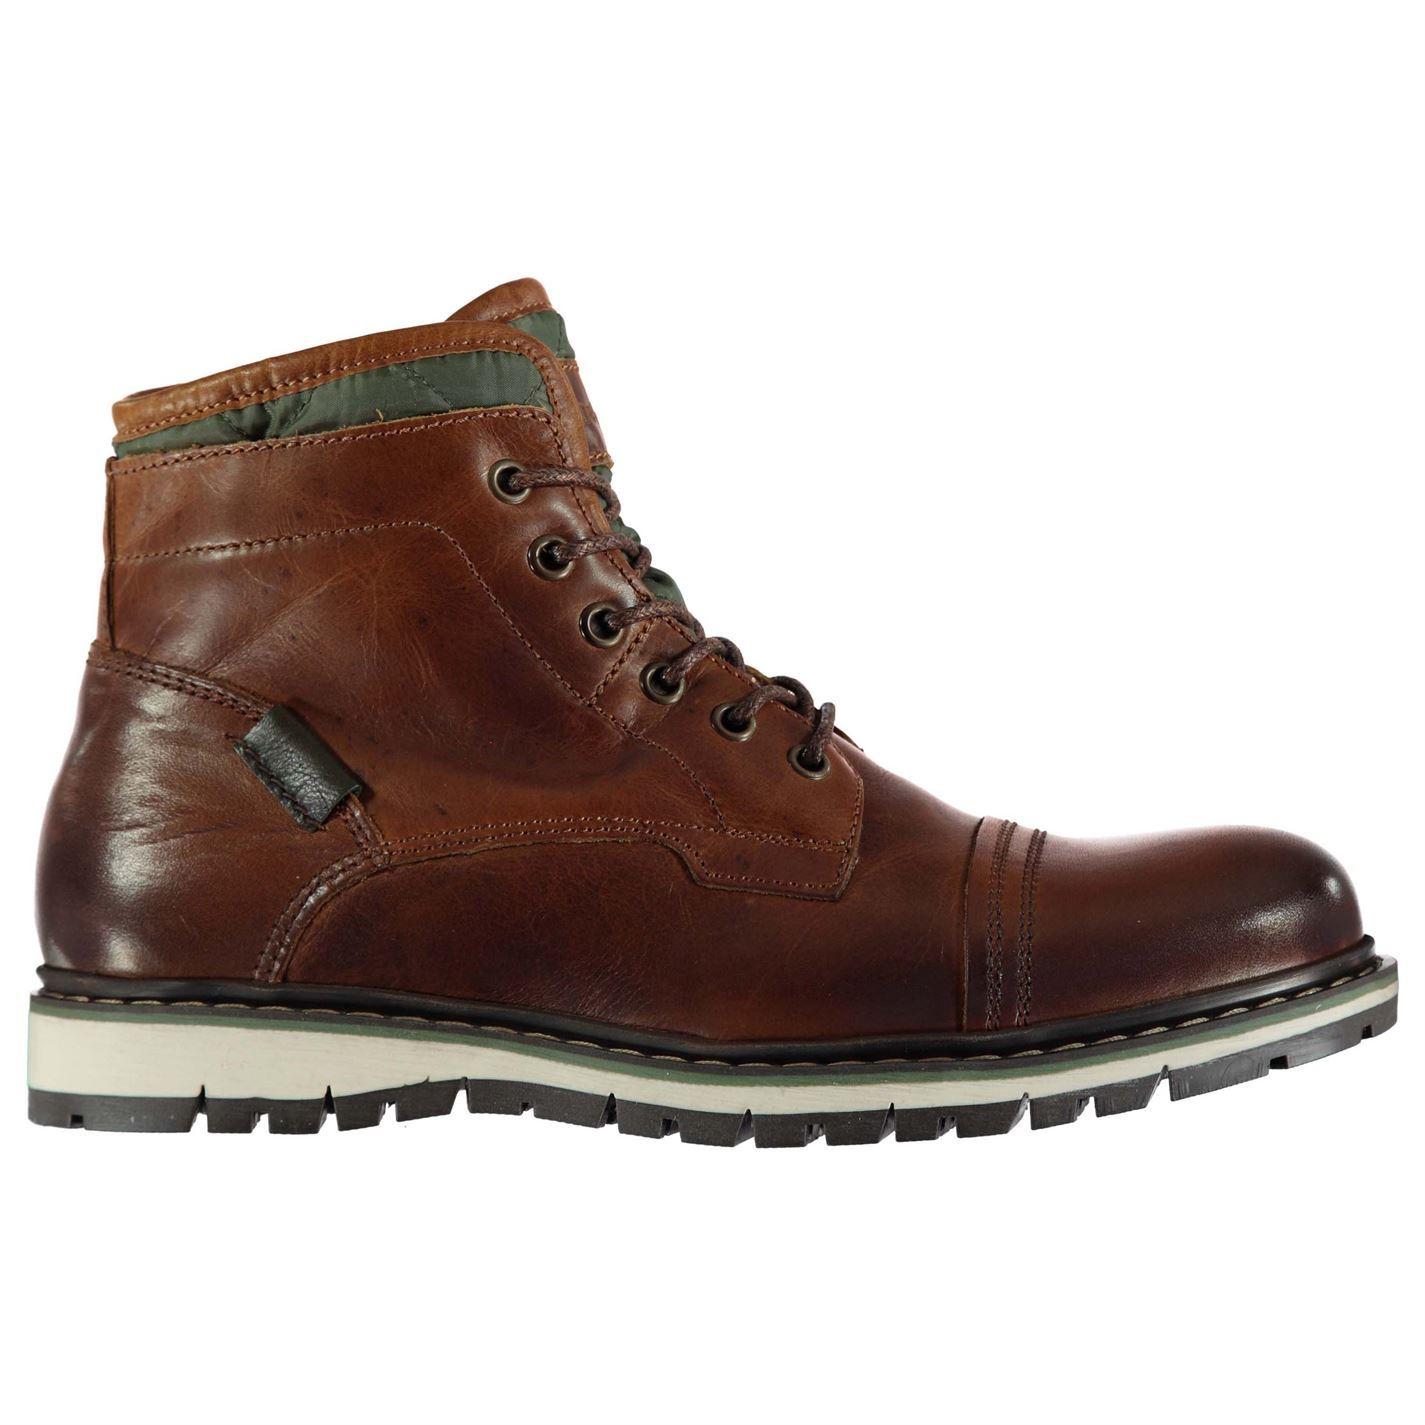 Firetrap Shoes Ebay Uk